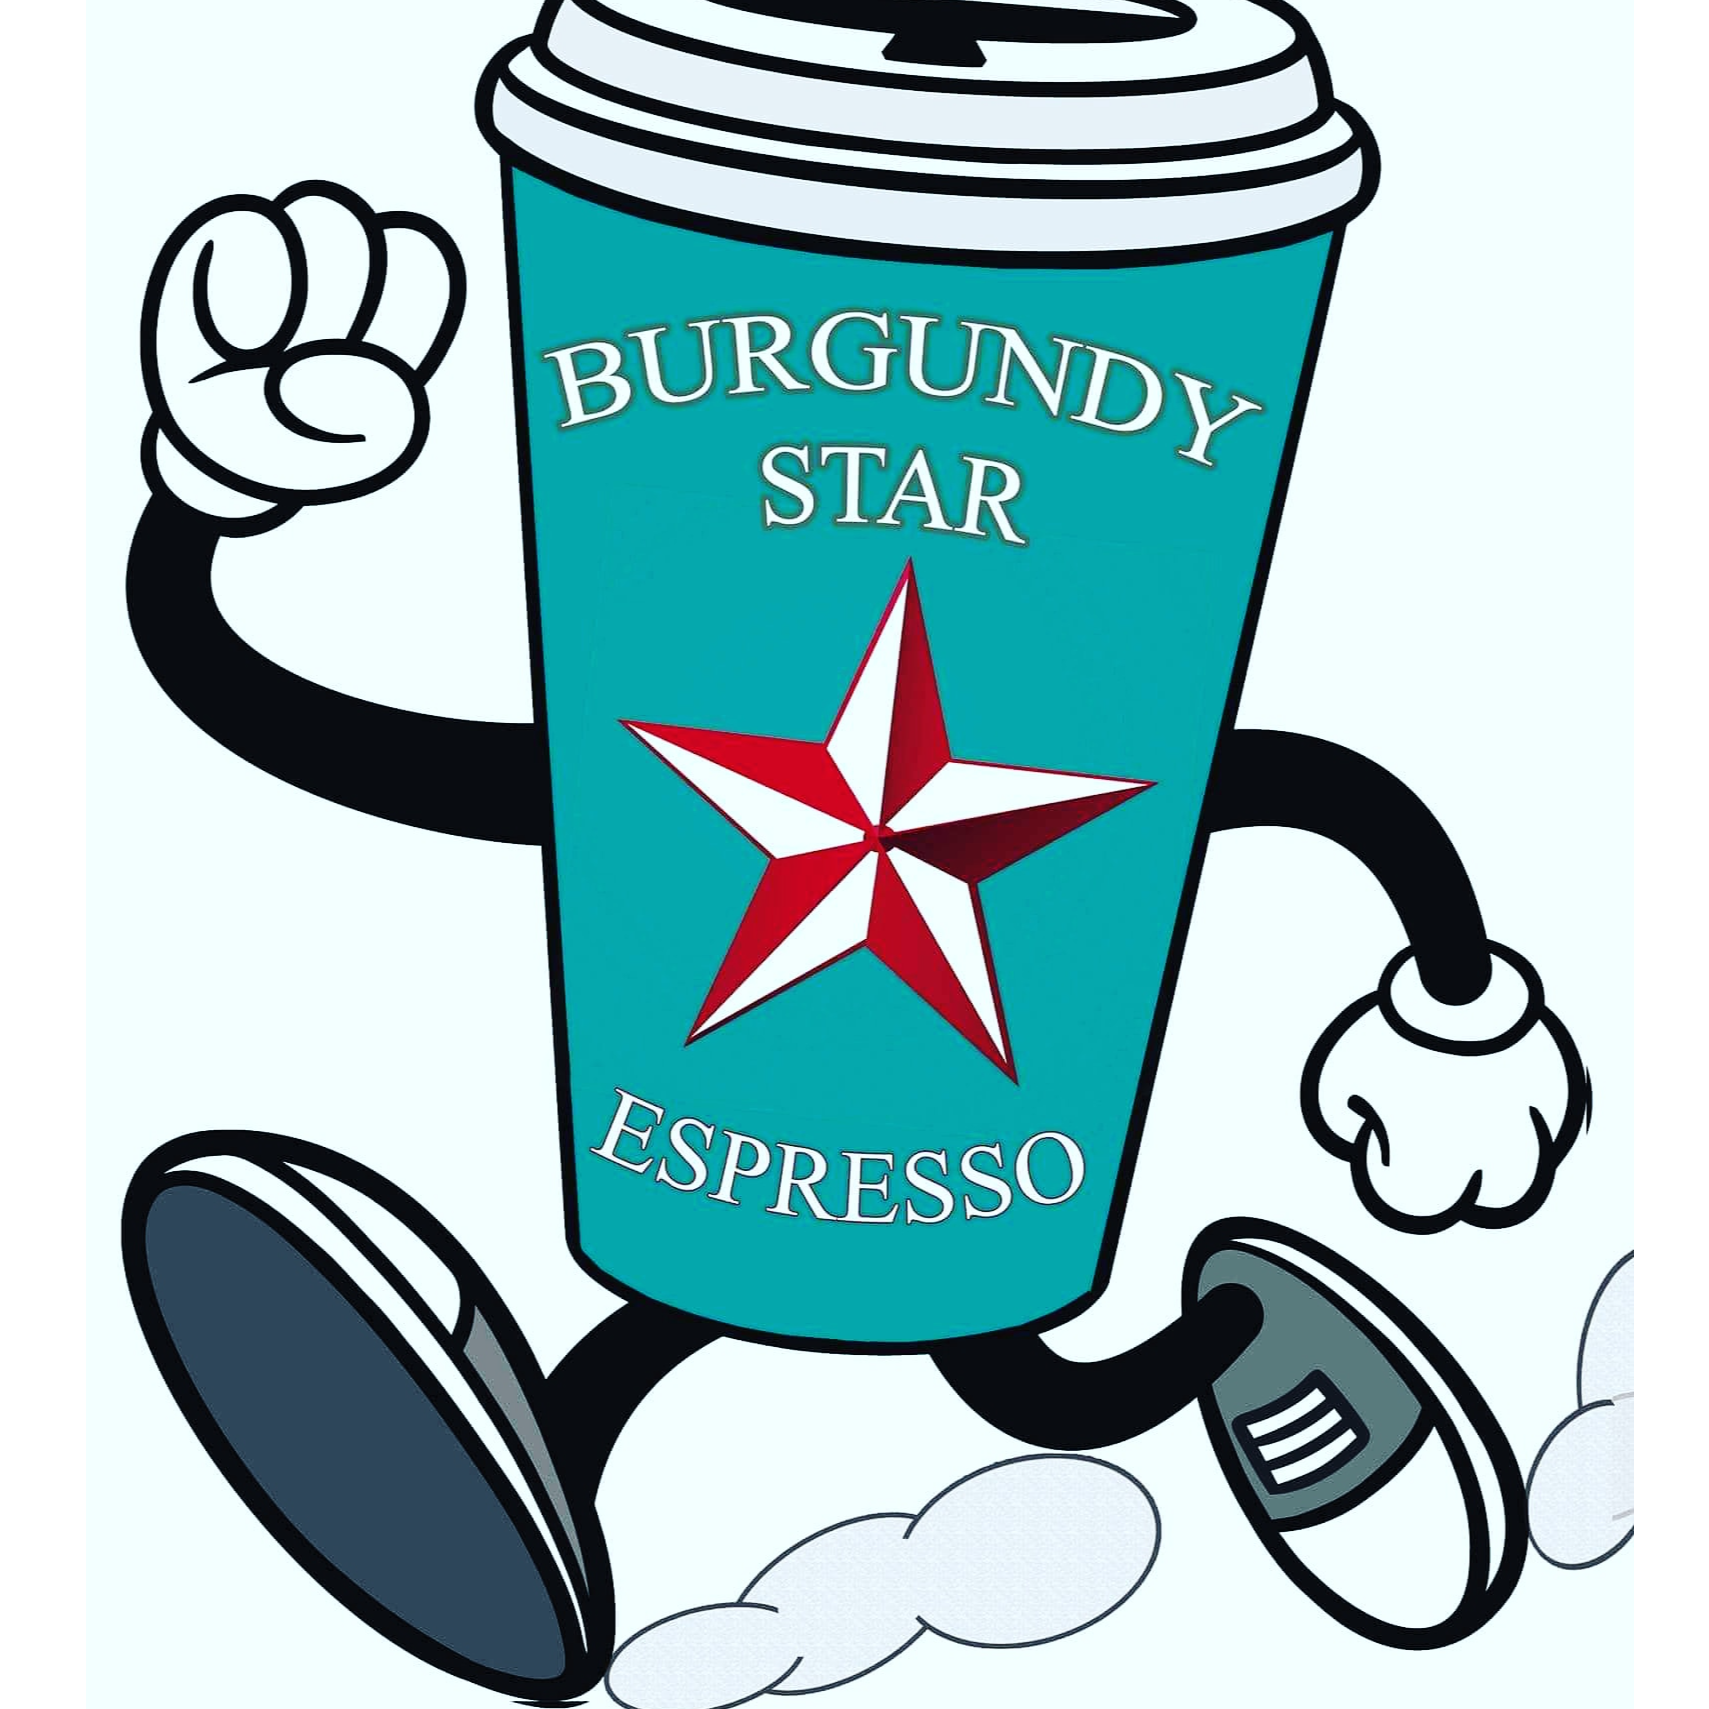 Burgundy Star Espresso logo